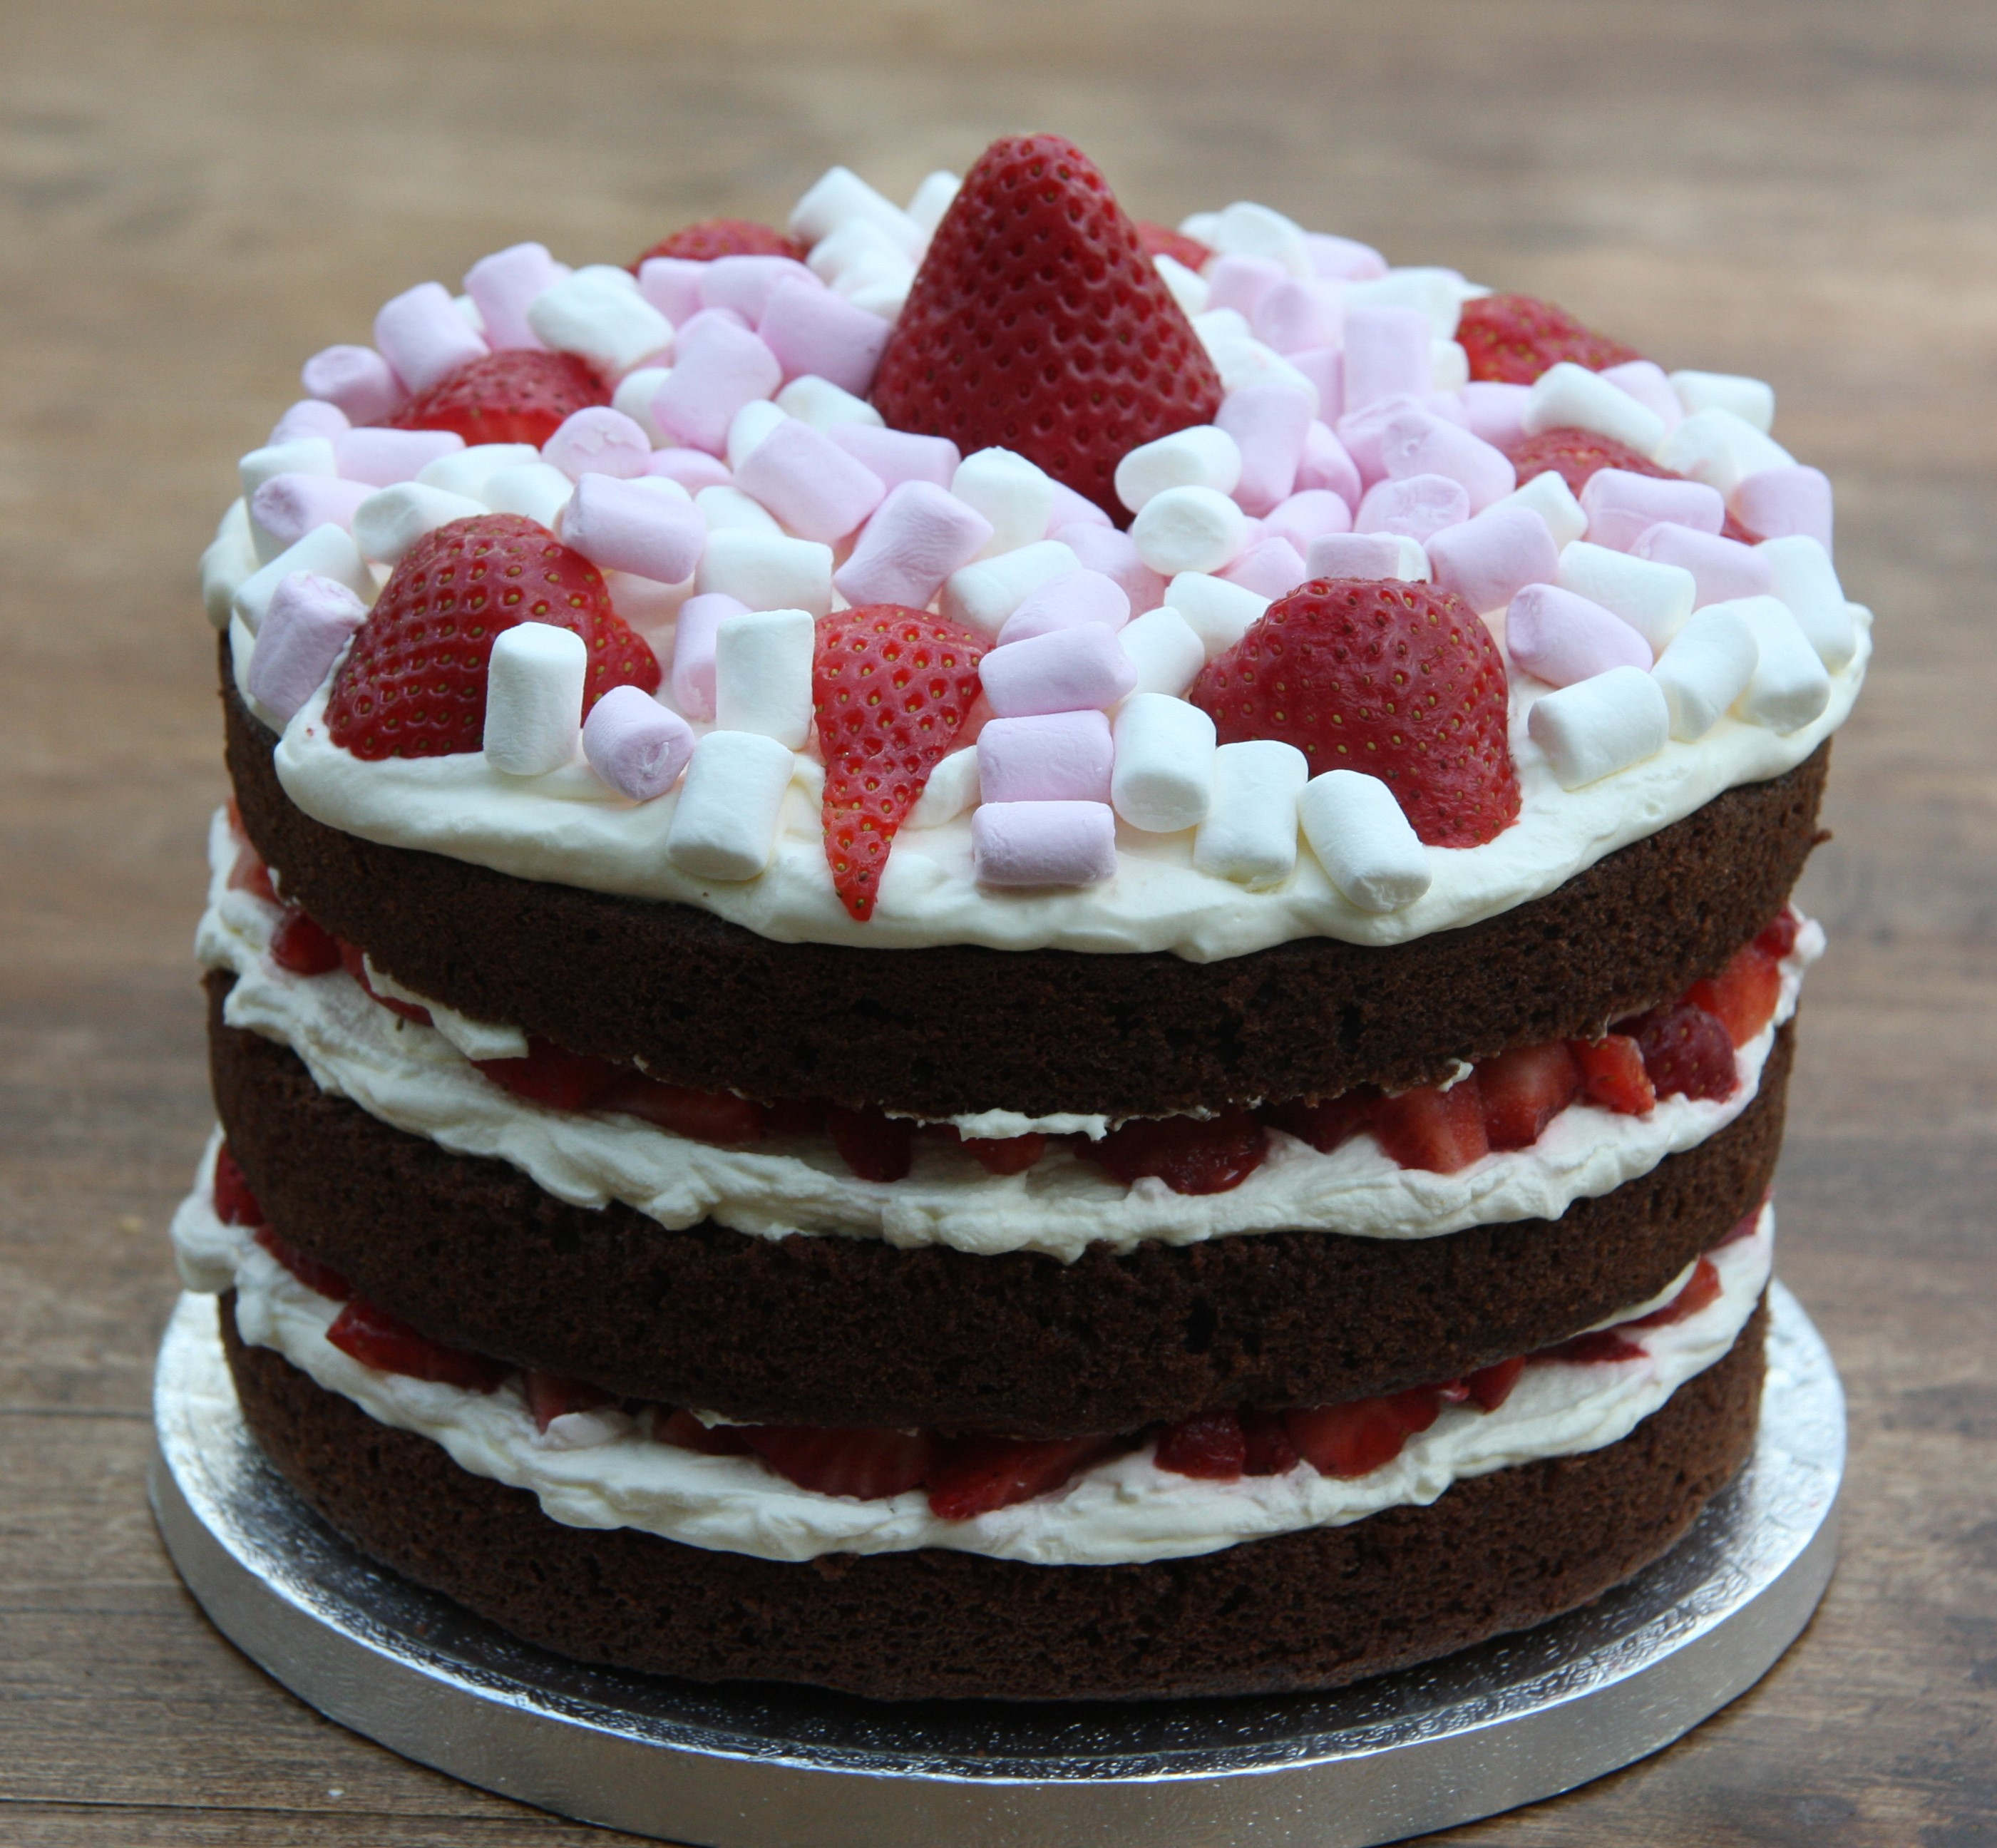 Chocolate Birthday Cake With Strawberries And Cream And